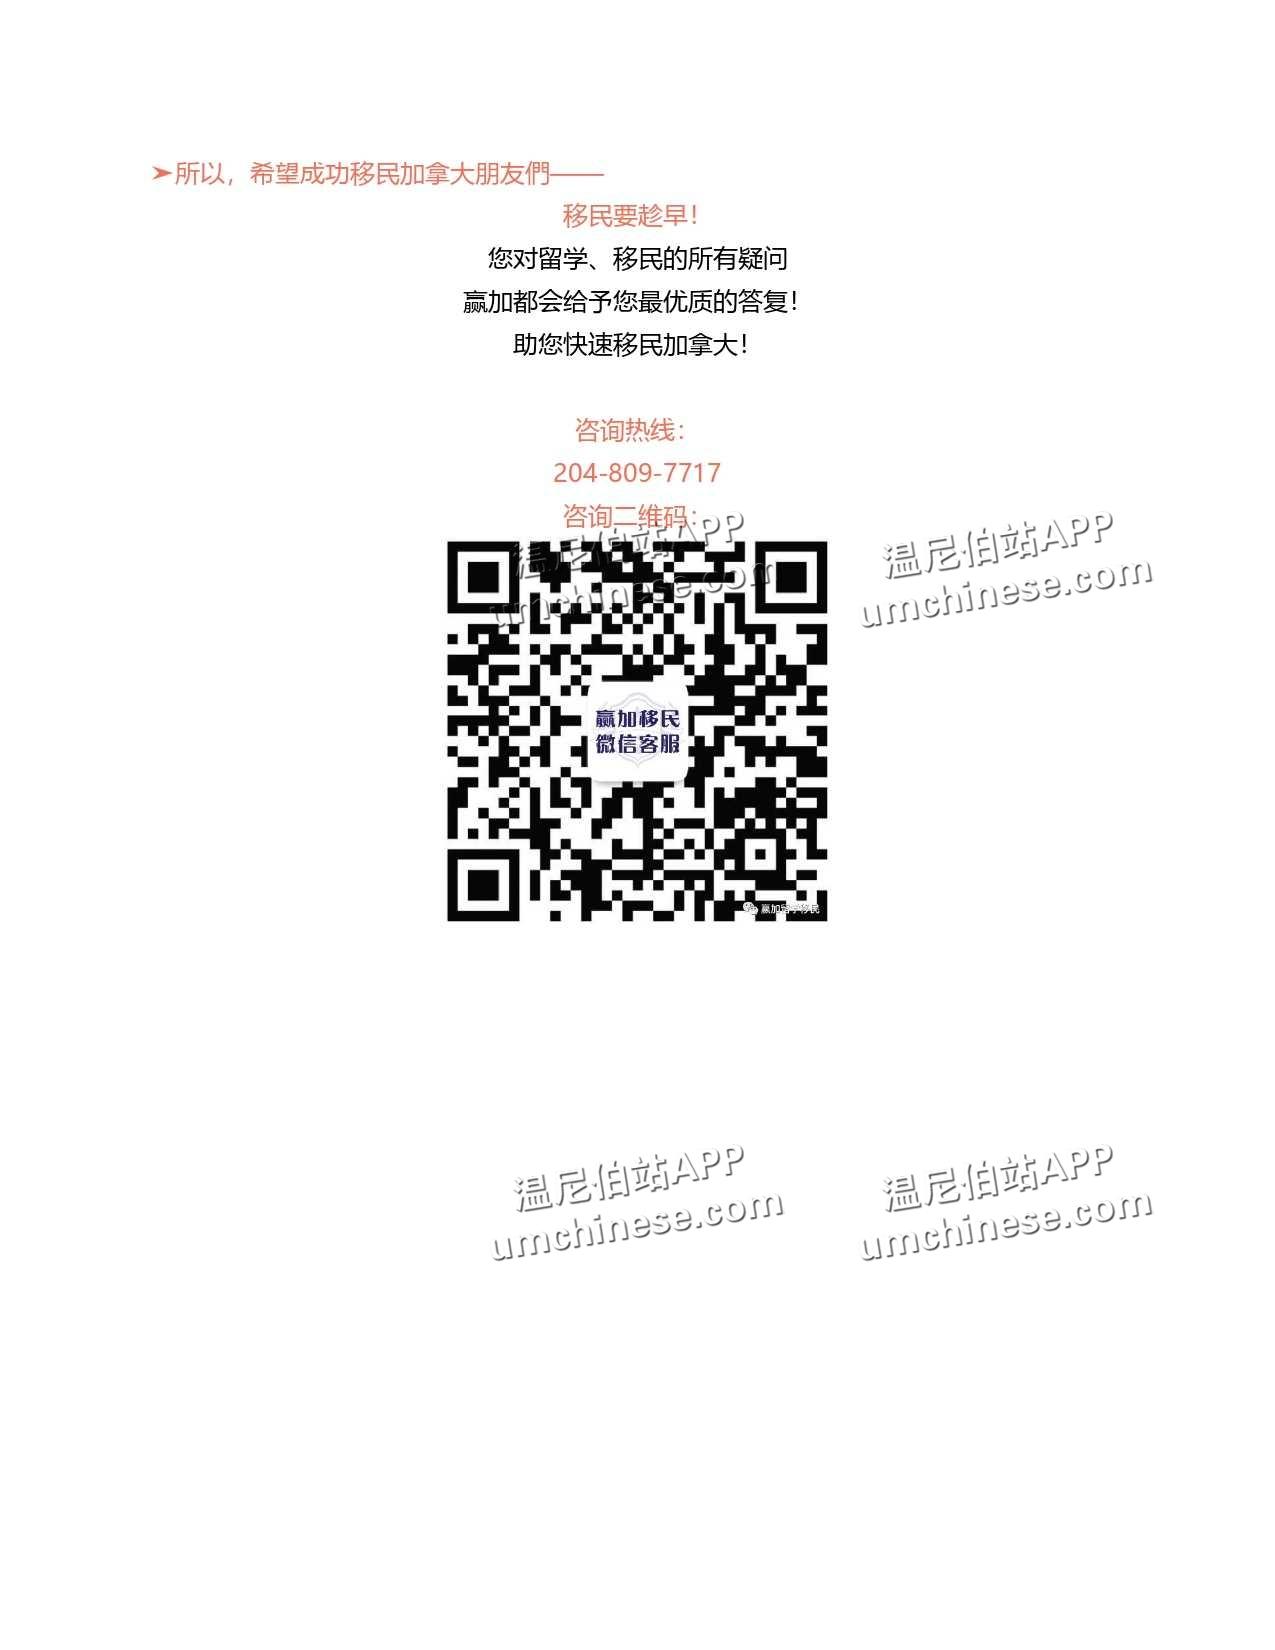 香港政策_page-0011.jpg